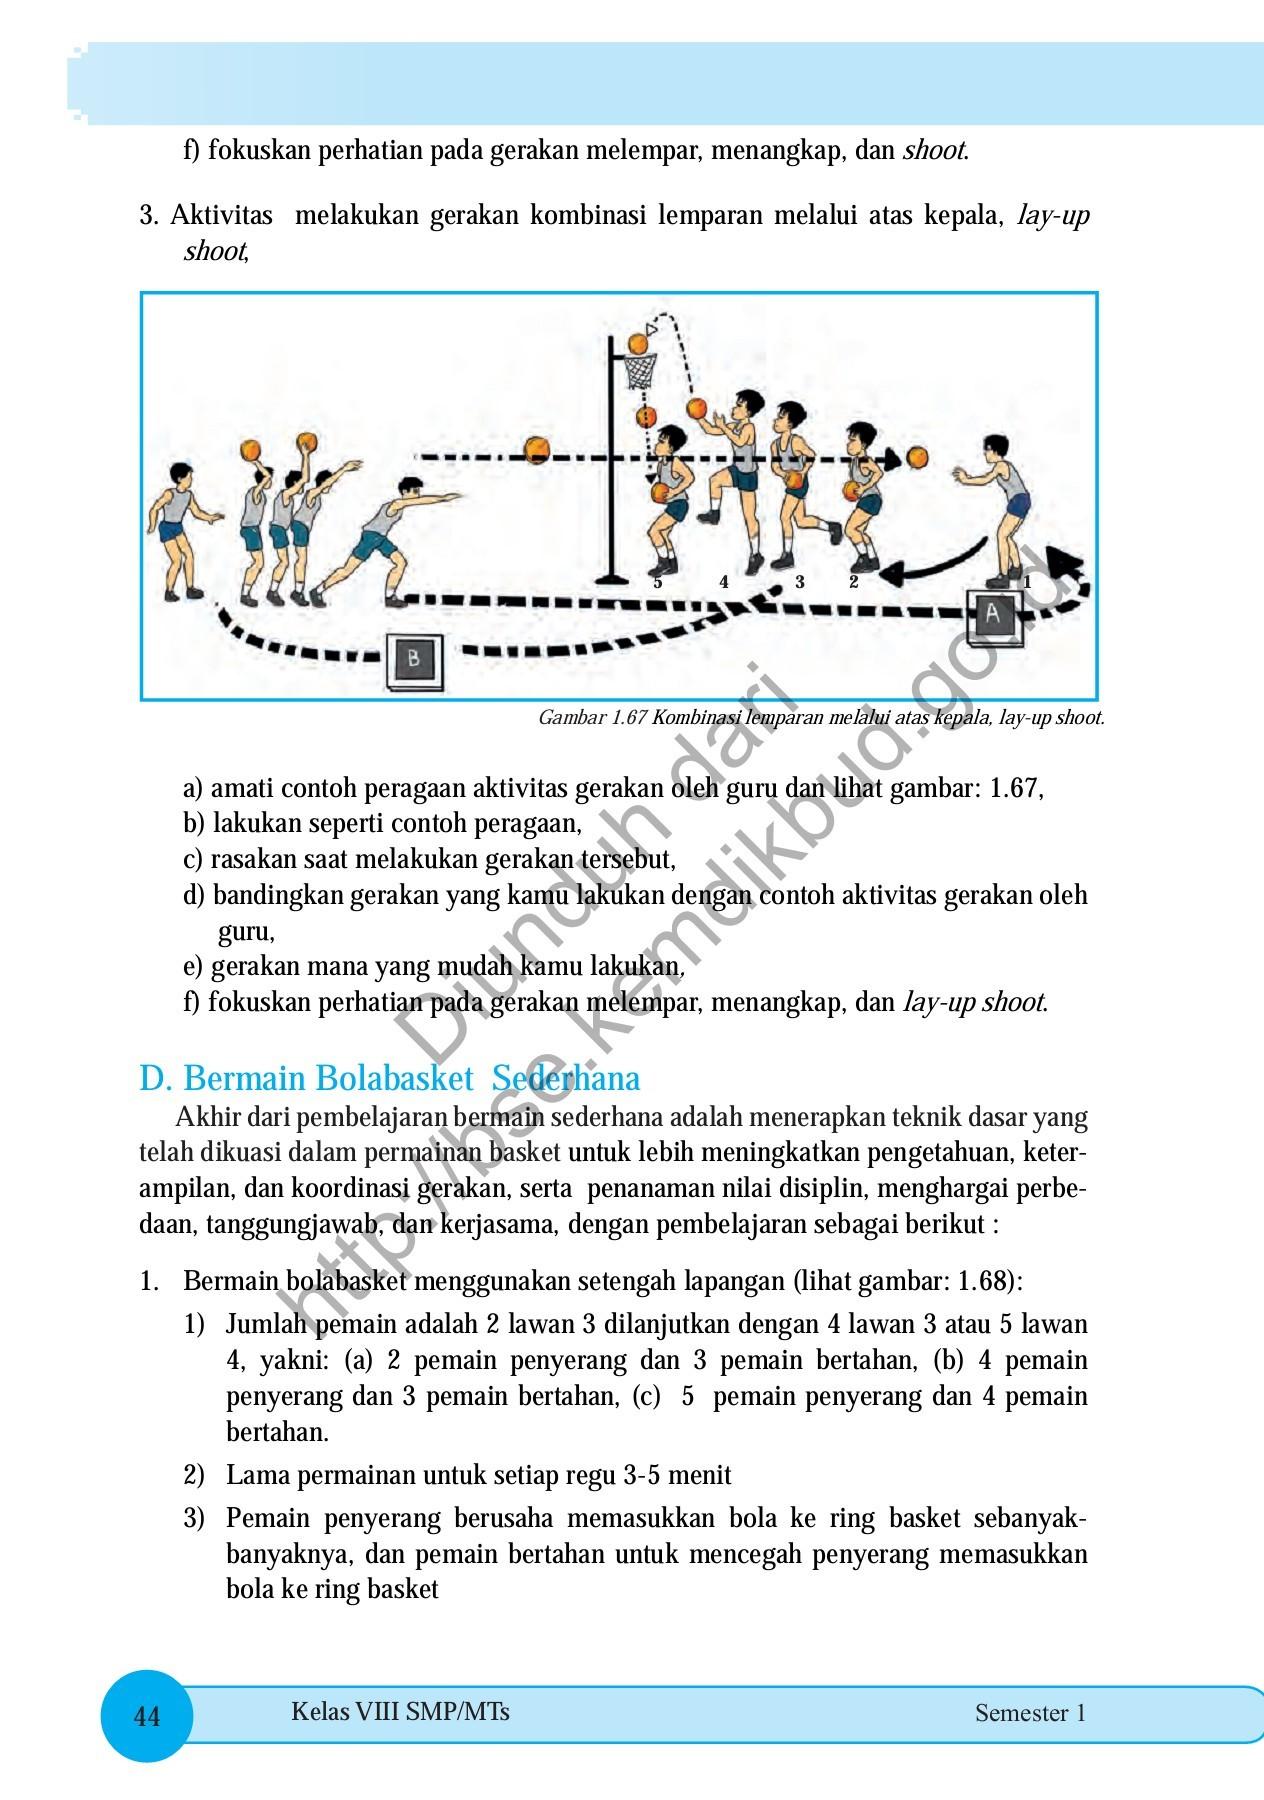 Posisi Awal Badan Passing Atau Lemparan Bolabasket Melalui Atas Kepala Adalah : posisi, badan, passing, lemparan, bolabasket, melalui, kepala, adalah, Posisi, Badan, Passing, Lemparan, Basket, Melalui, Kepala, Adalah, Dapatkan